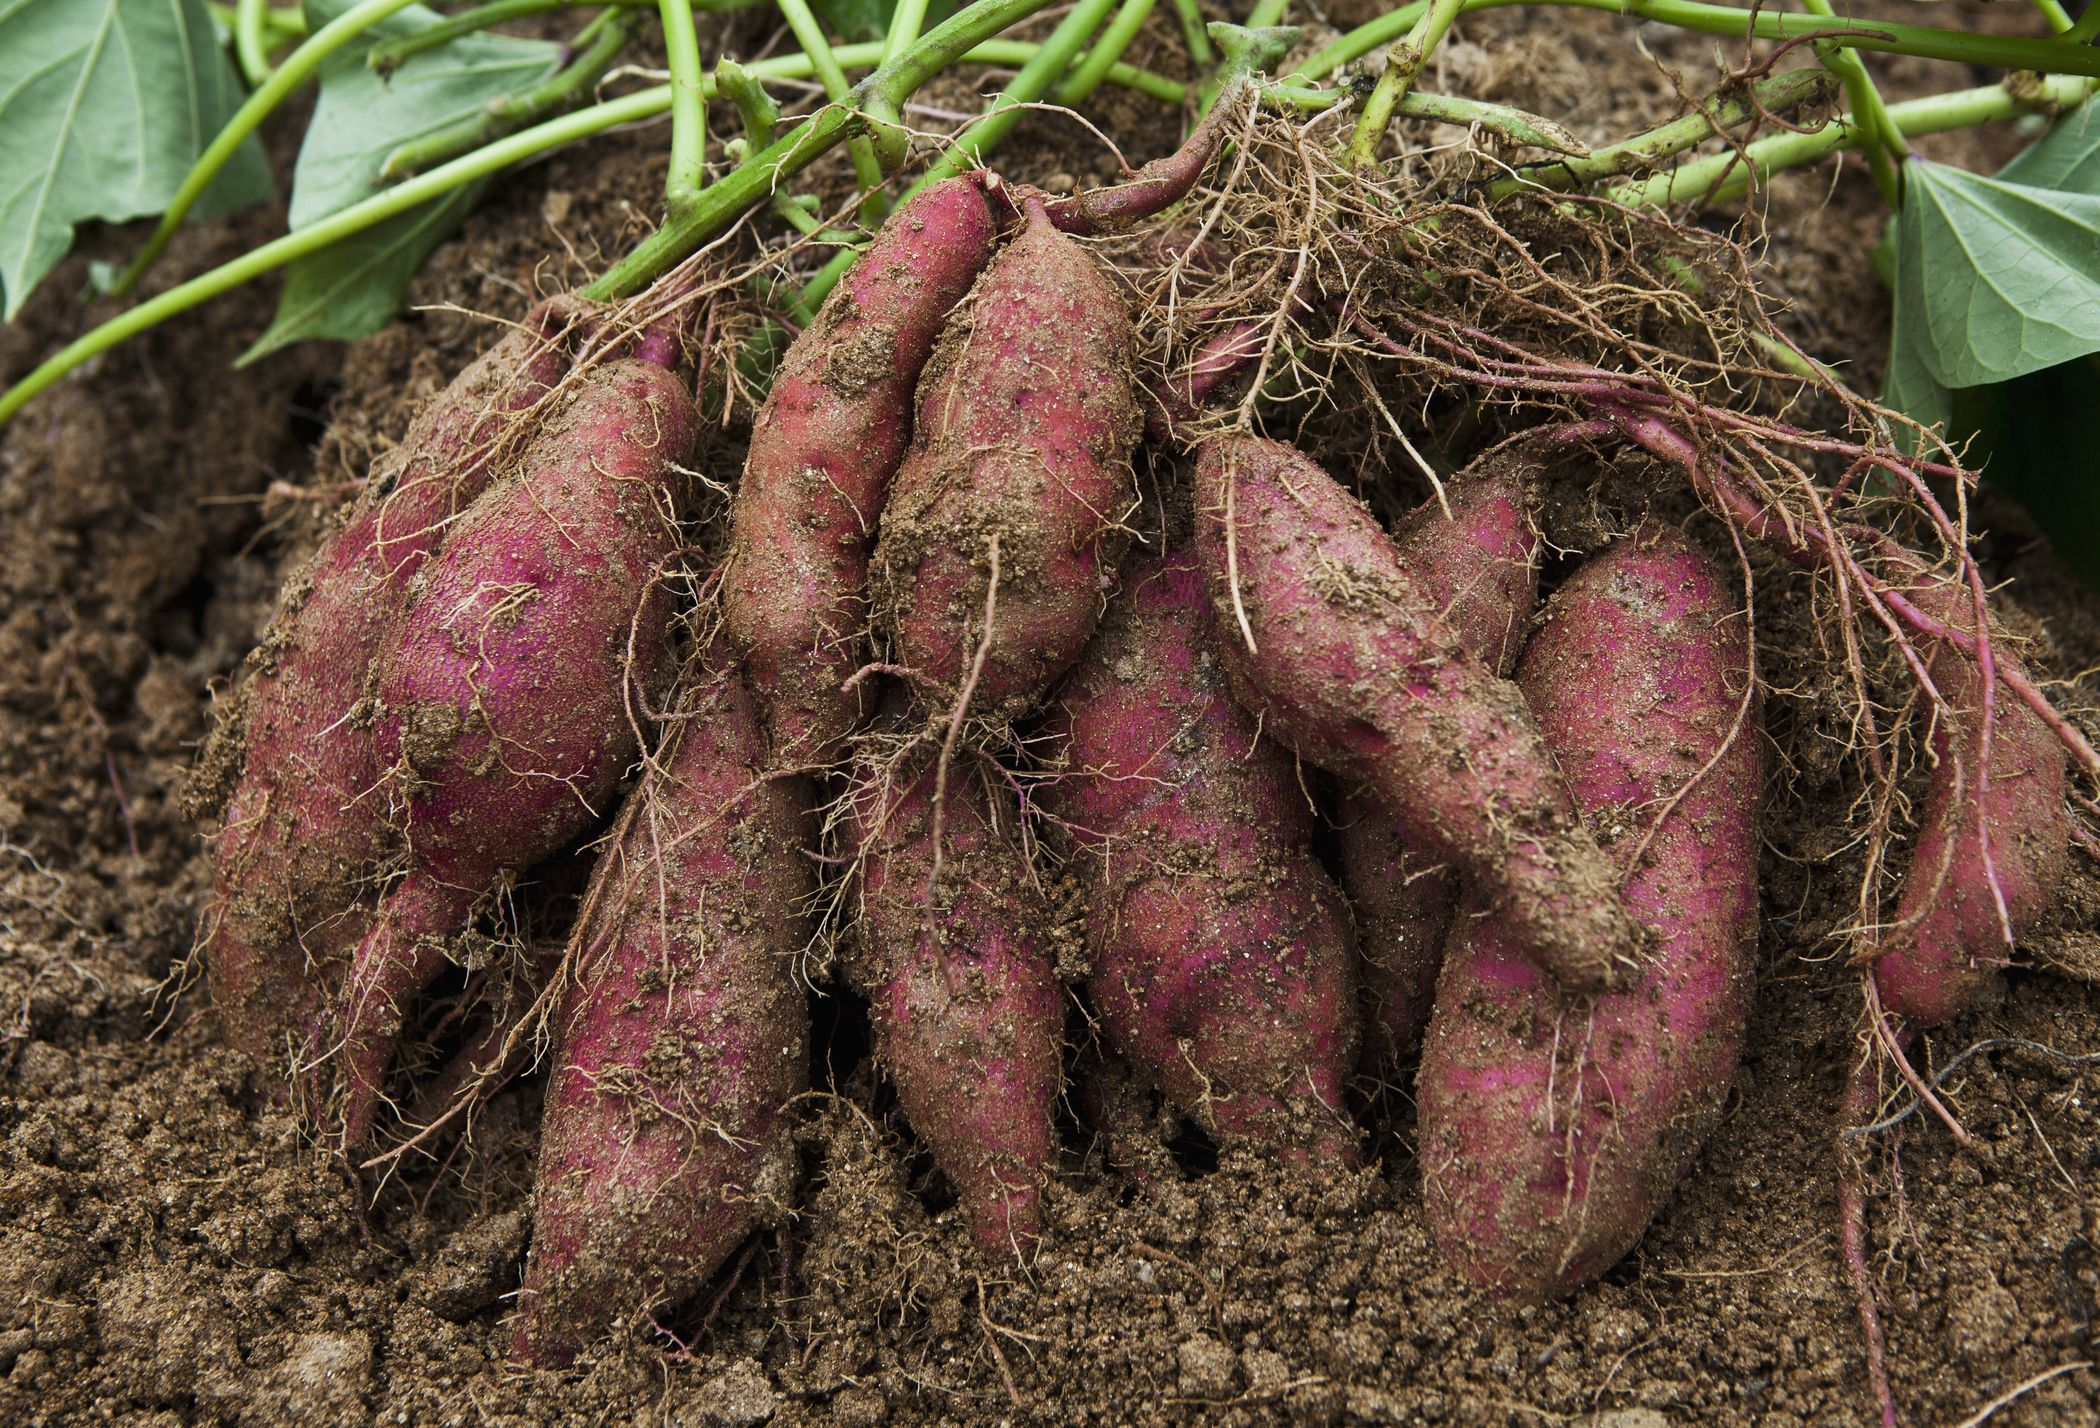 Sweet-potatoes-GettyImages-592411298-58bc9a215f9b58af5cc1ae4f.jpg